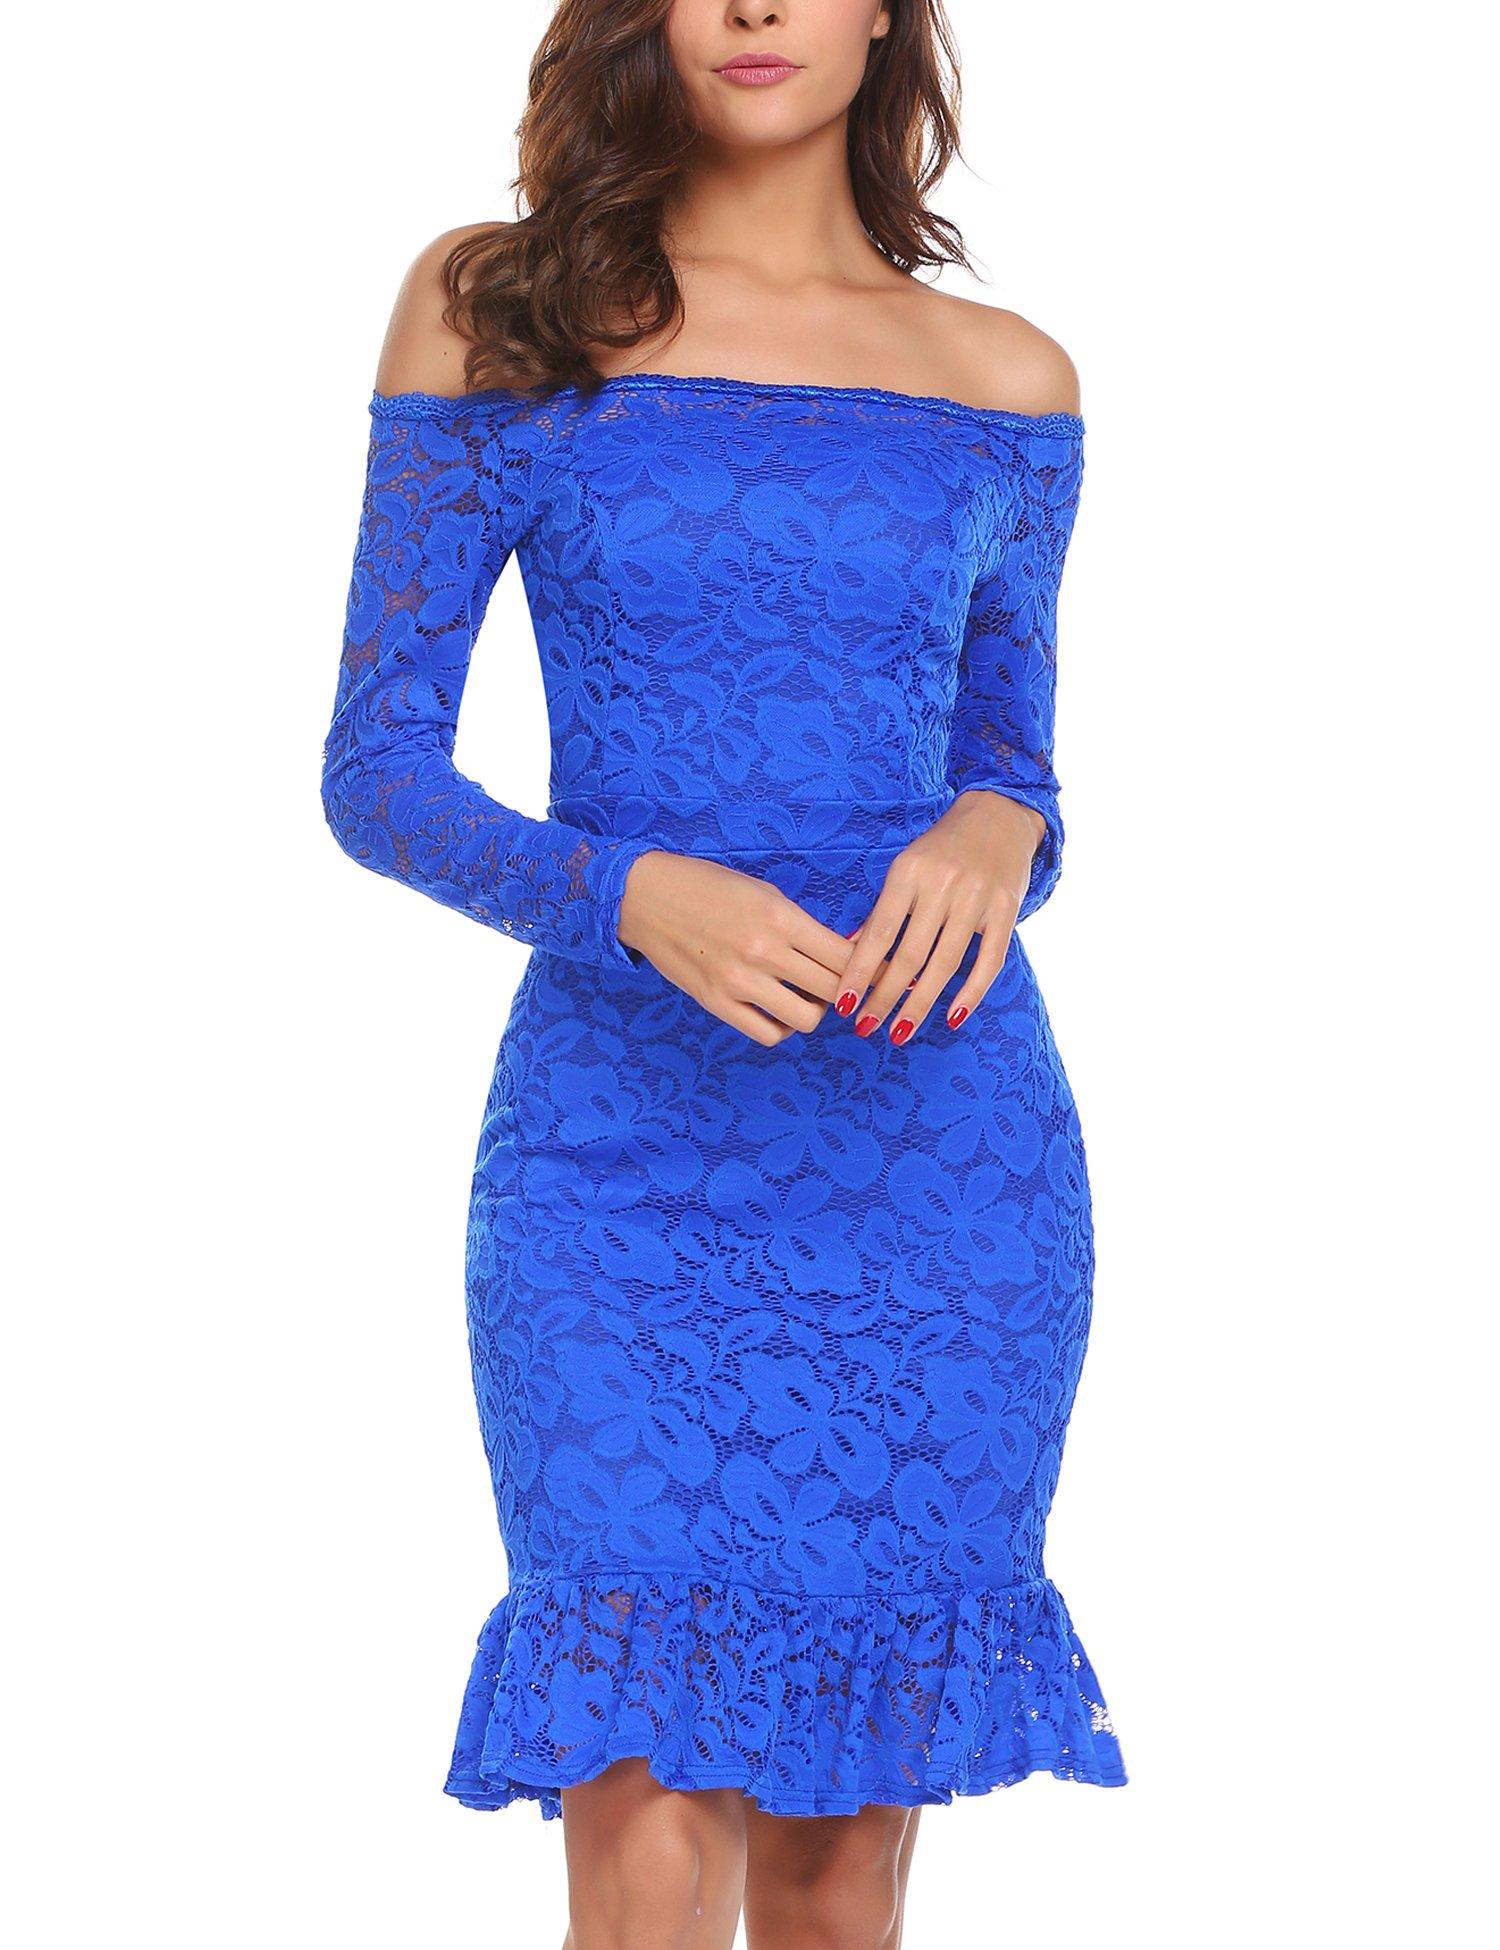 ANGVNS Women's Retro Floral Lace Long Sleeve Slim Evening Cocktail Mini Dress Royal Blue M